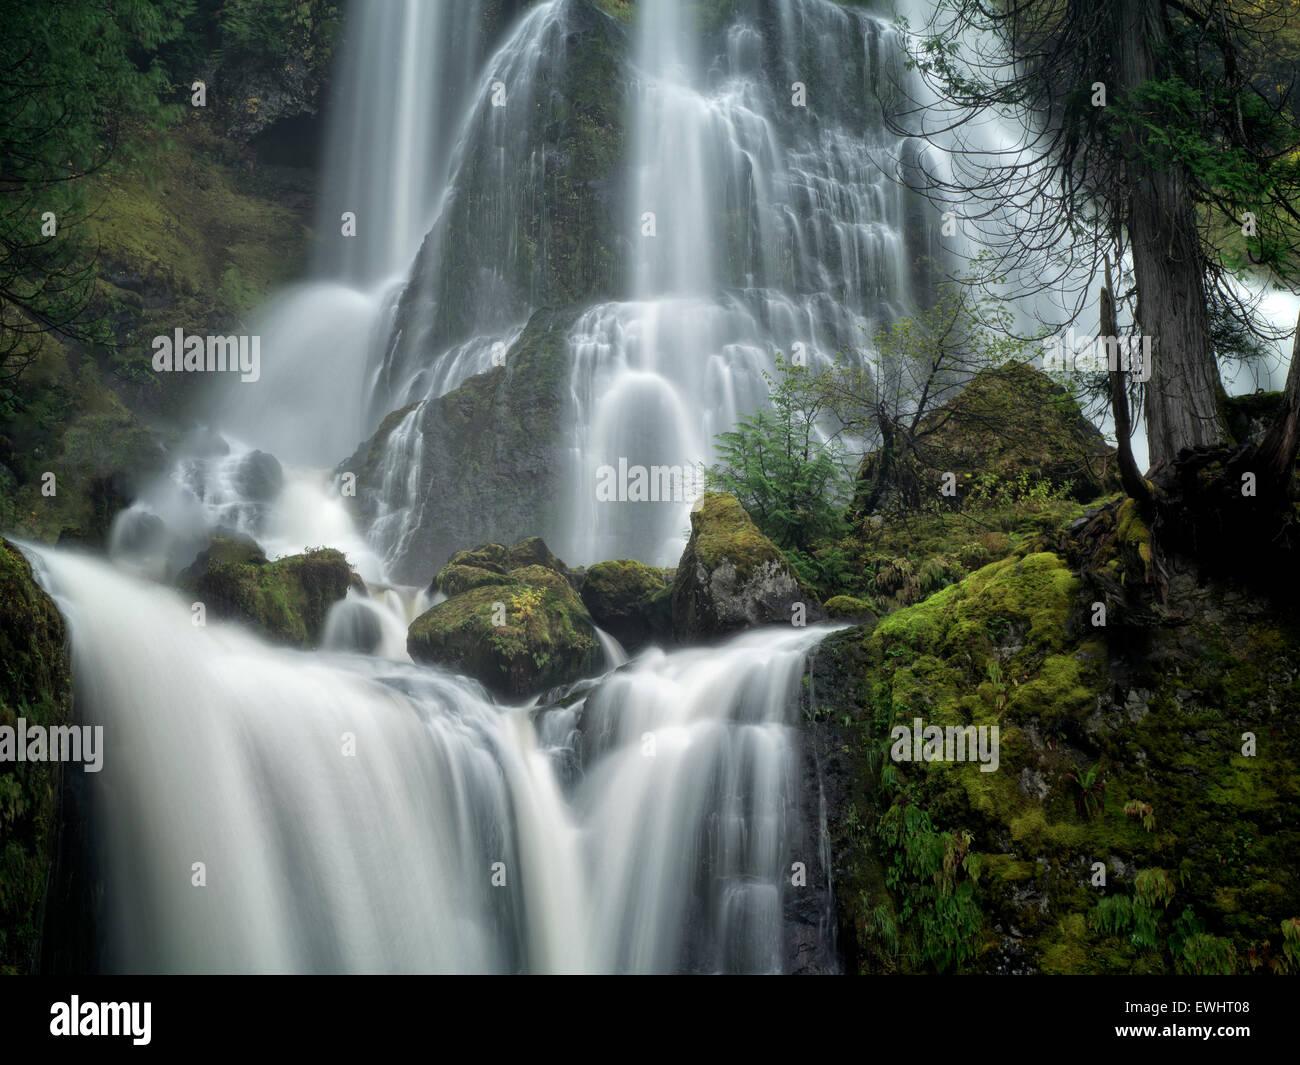 Falls Creek Falls, Washington. Imagen De Stock